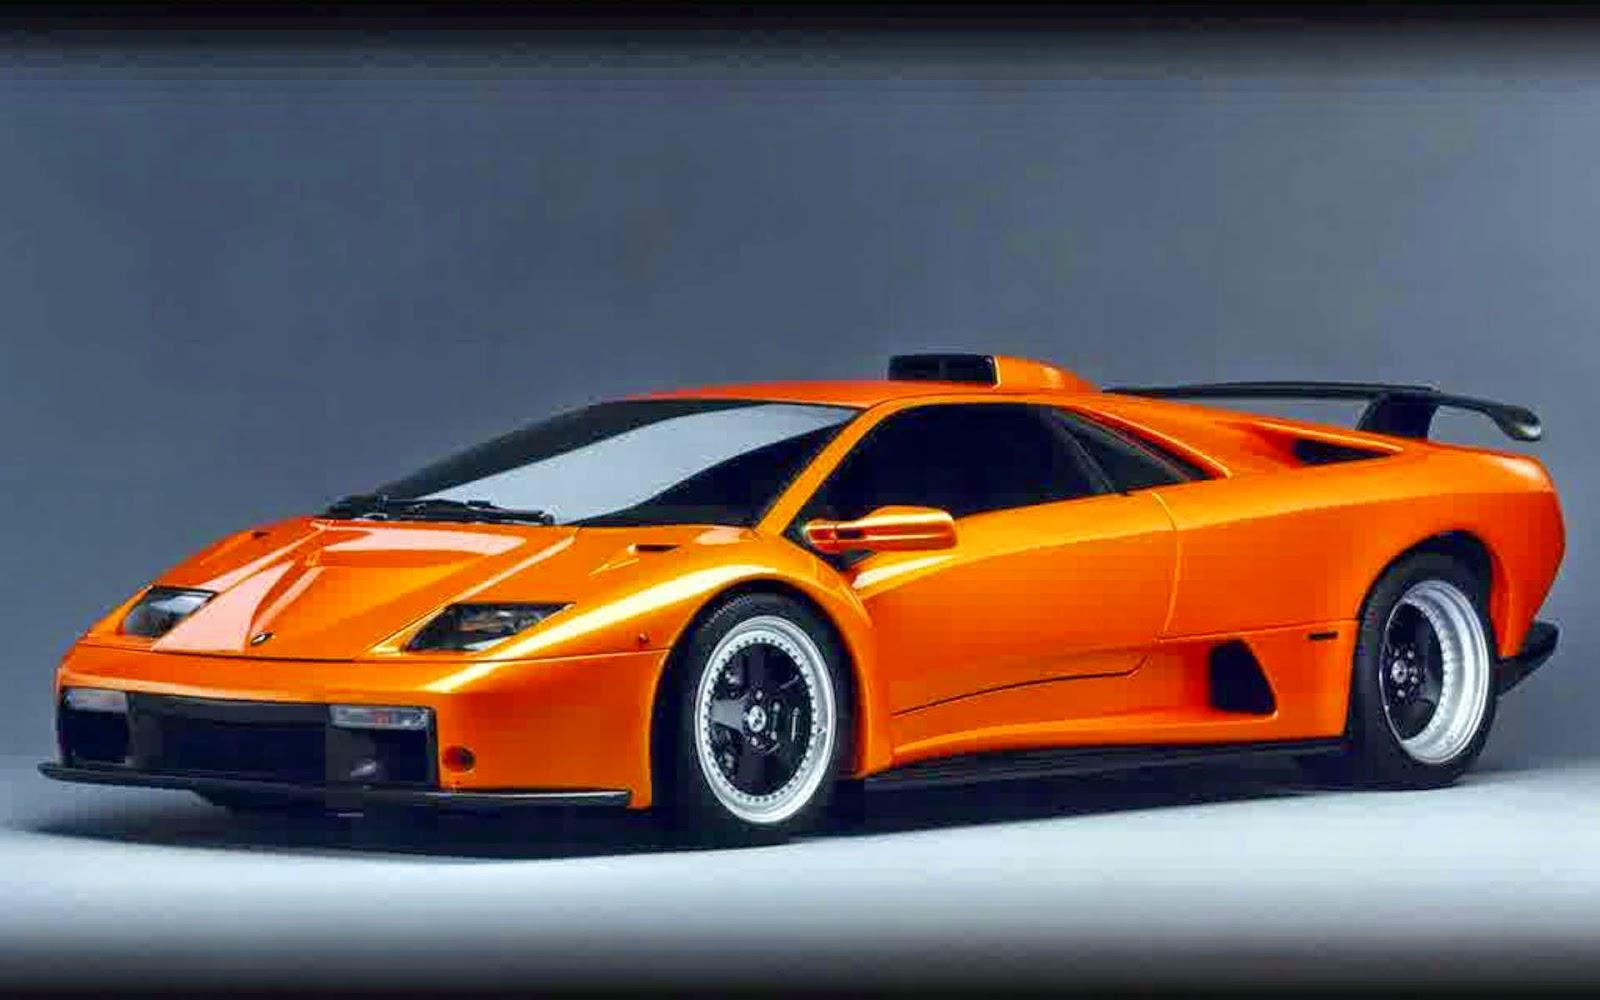 Ferrari Cars Images Reverse Search